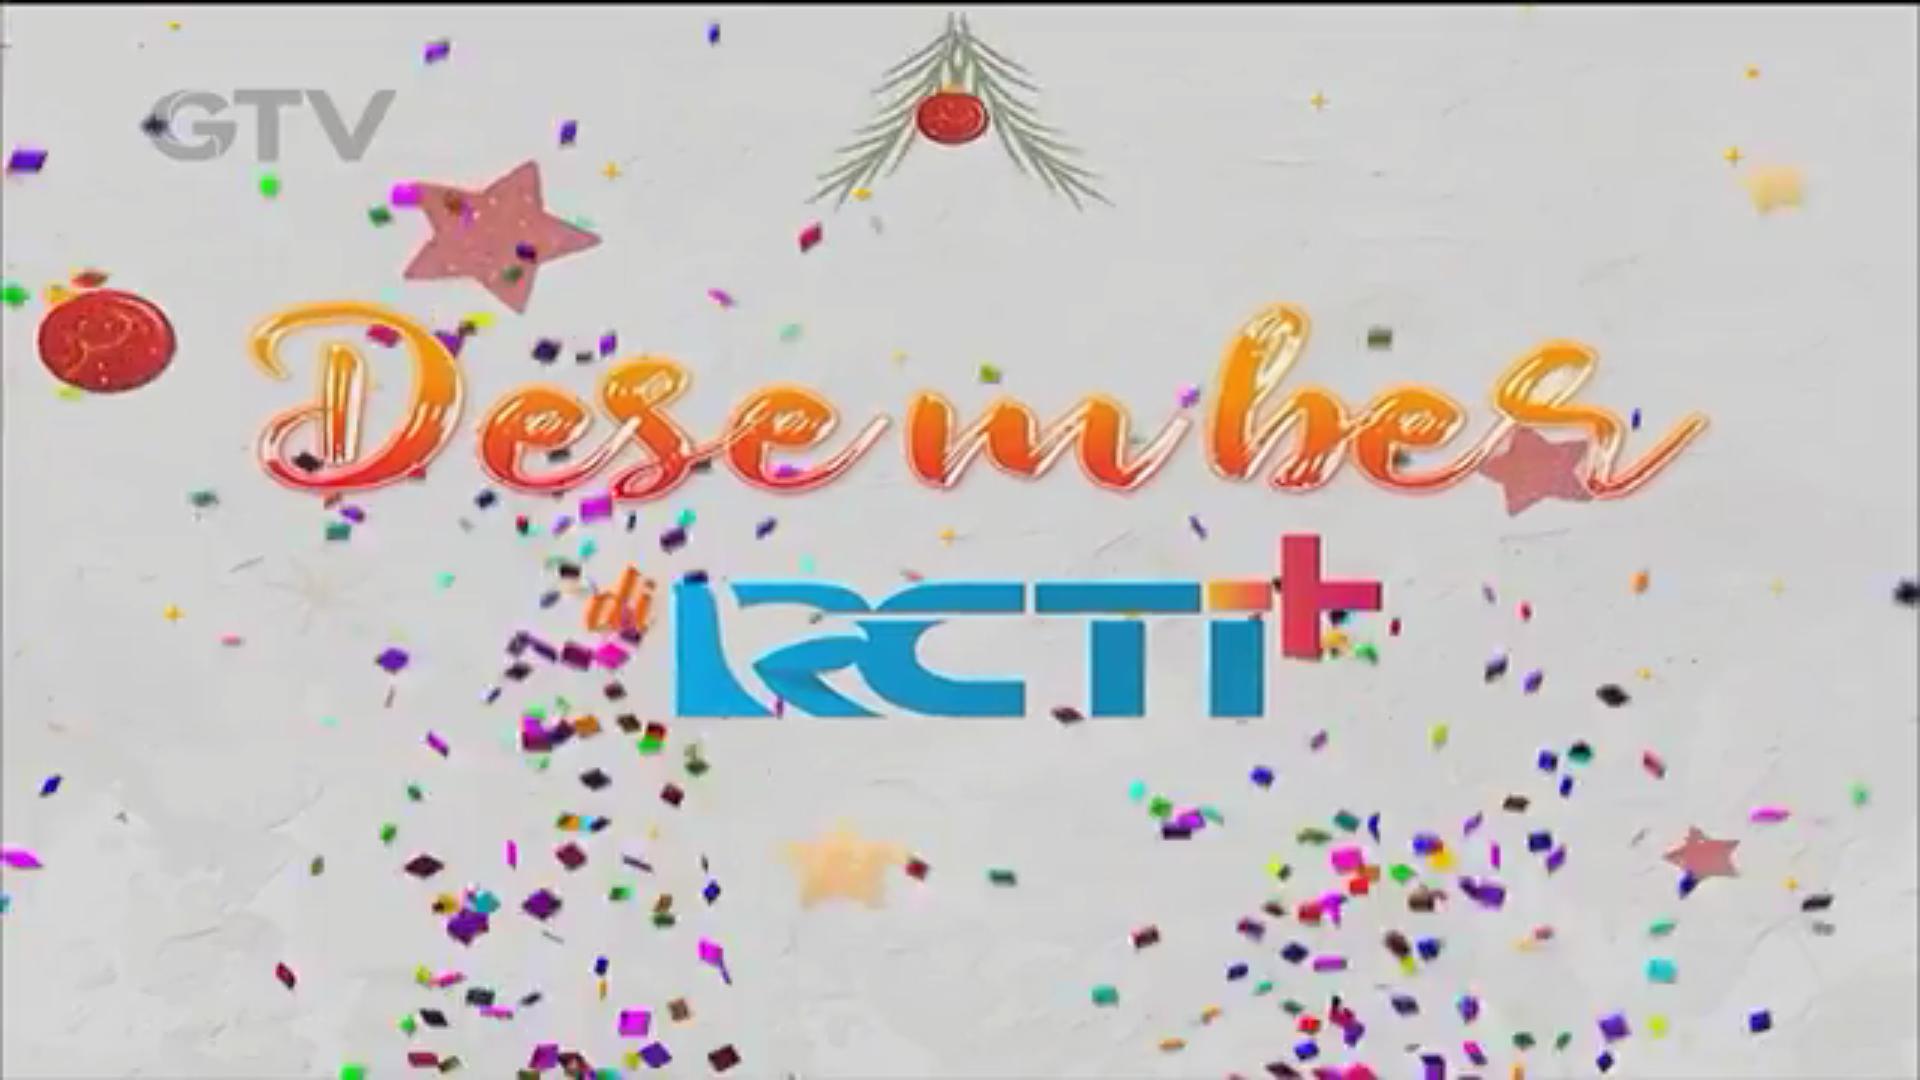 RCTI+/Other